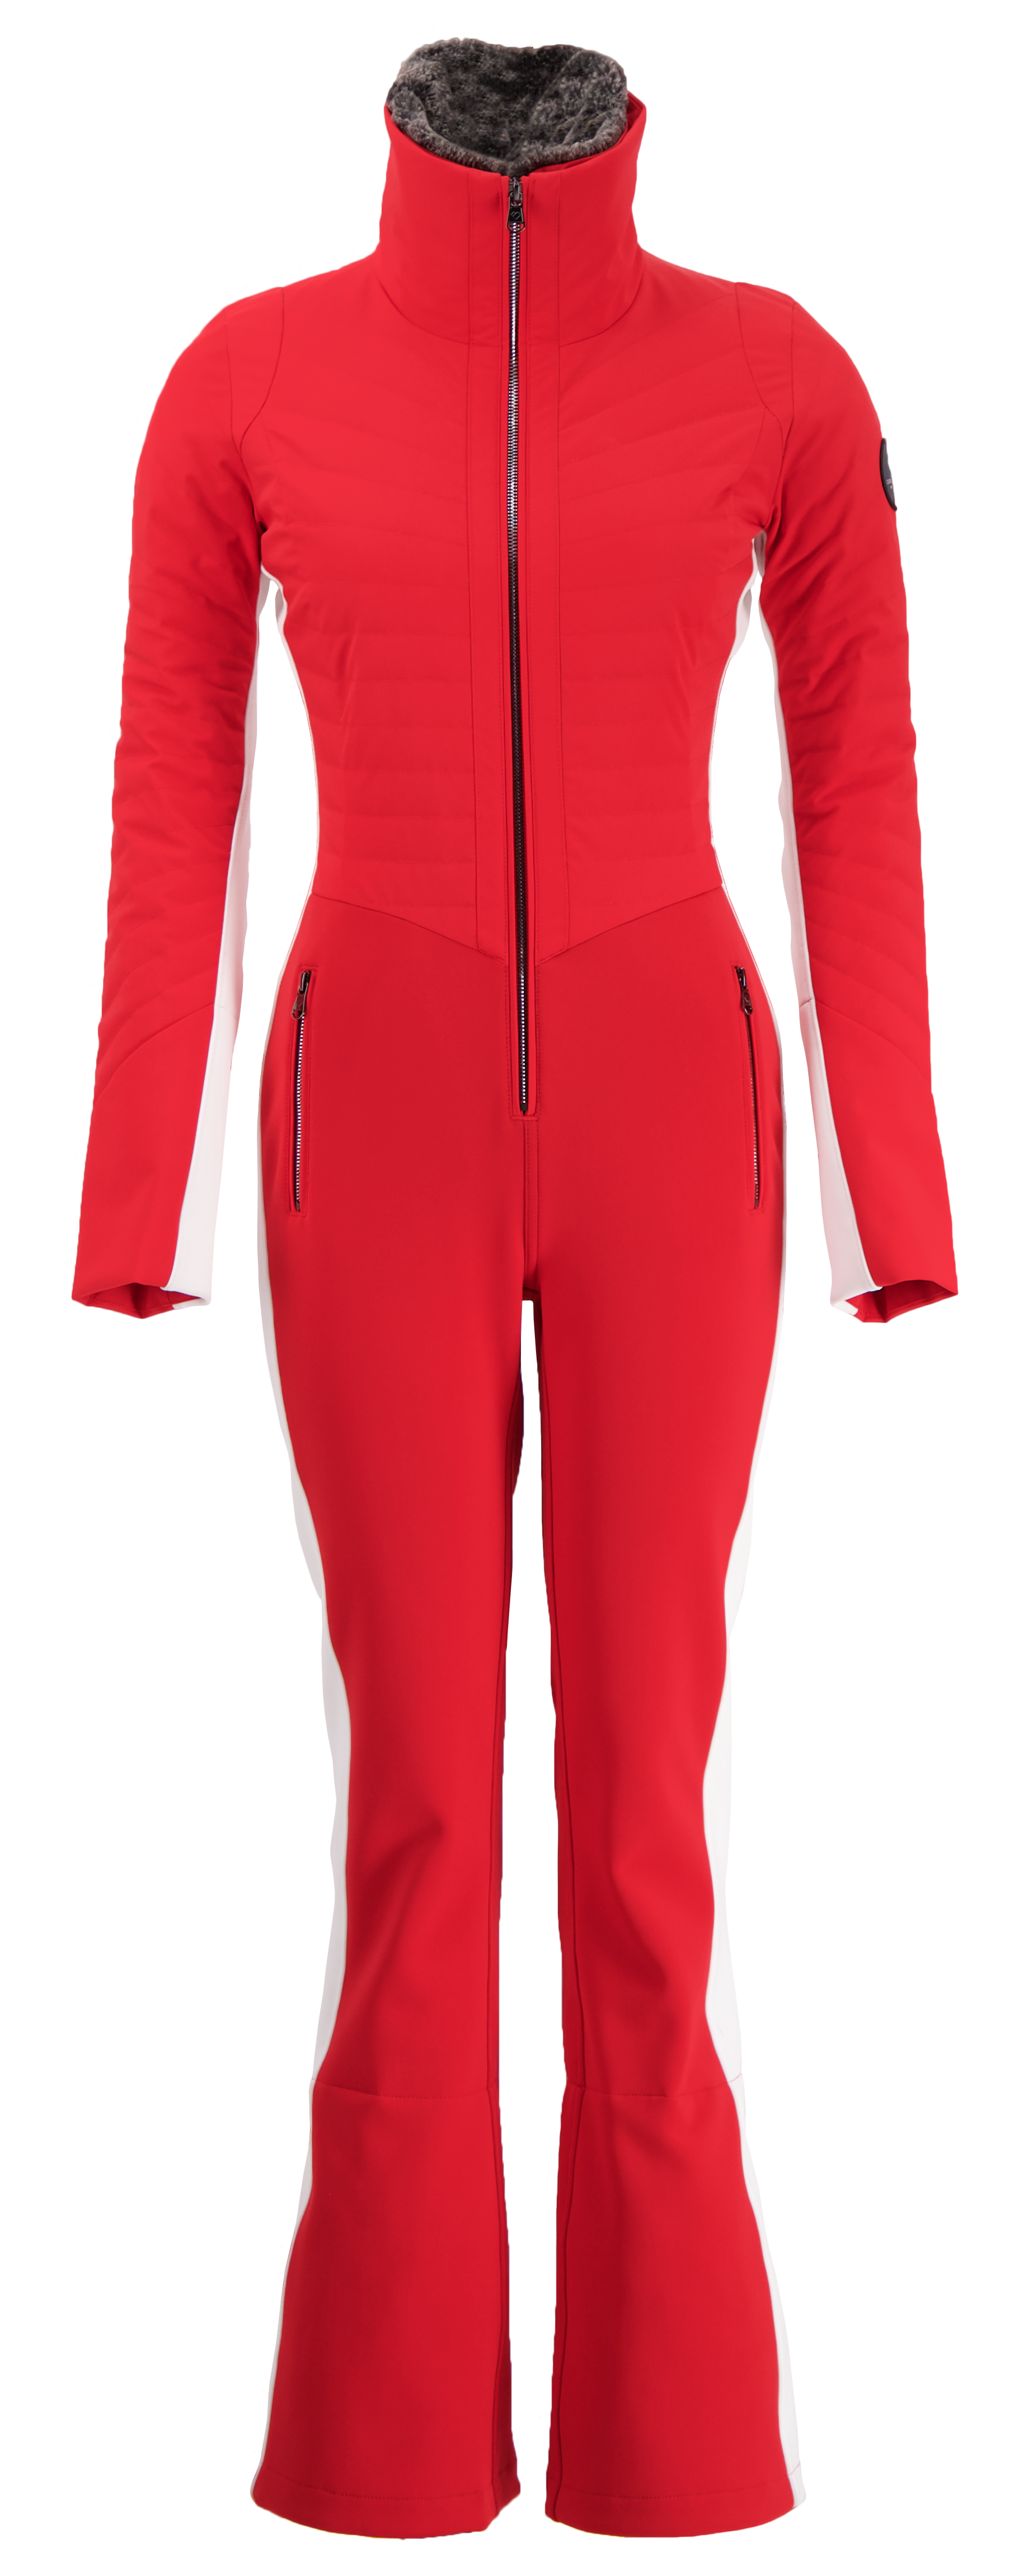 Spyder Andermatt jacket, $549, Killington pants, $385, and Web gloves, $65 Spy Scoop XS sunglasses, $127